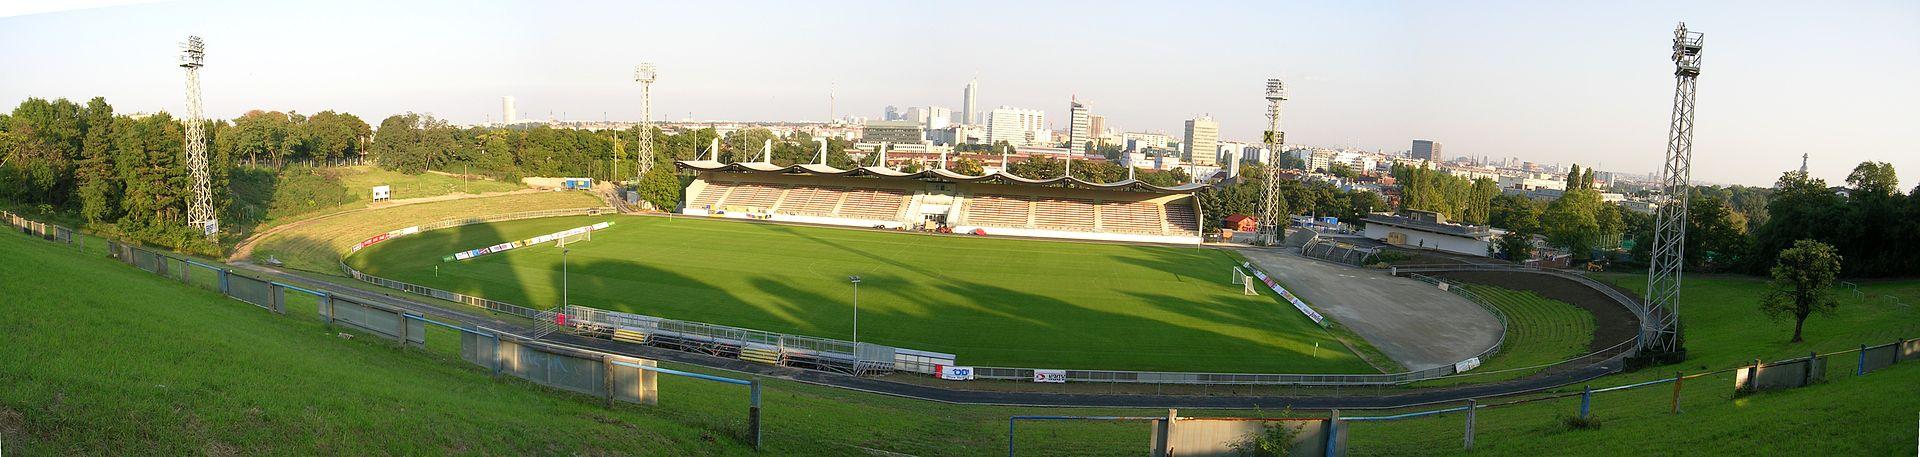 Casino-Stadion Hohe Warte.jpg